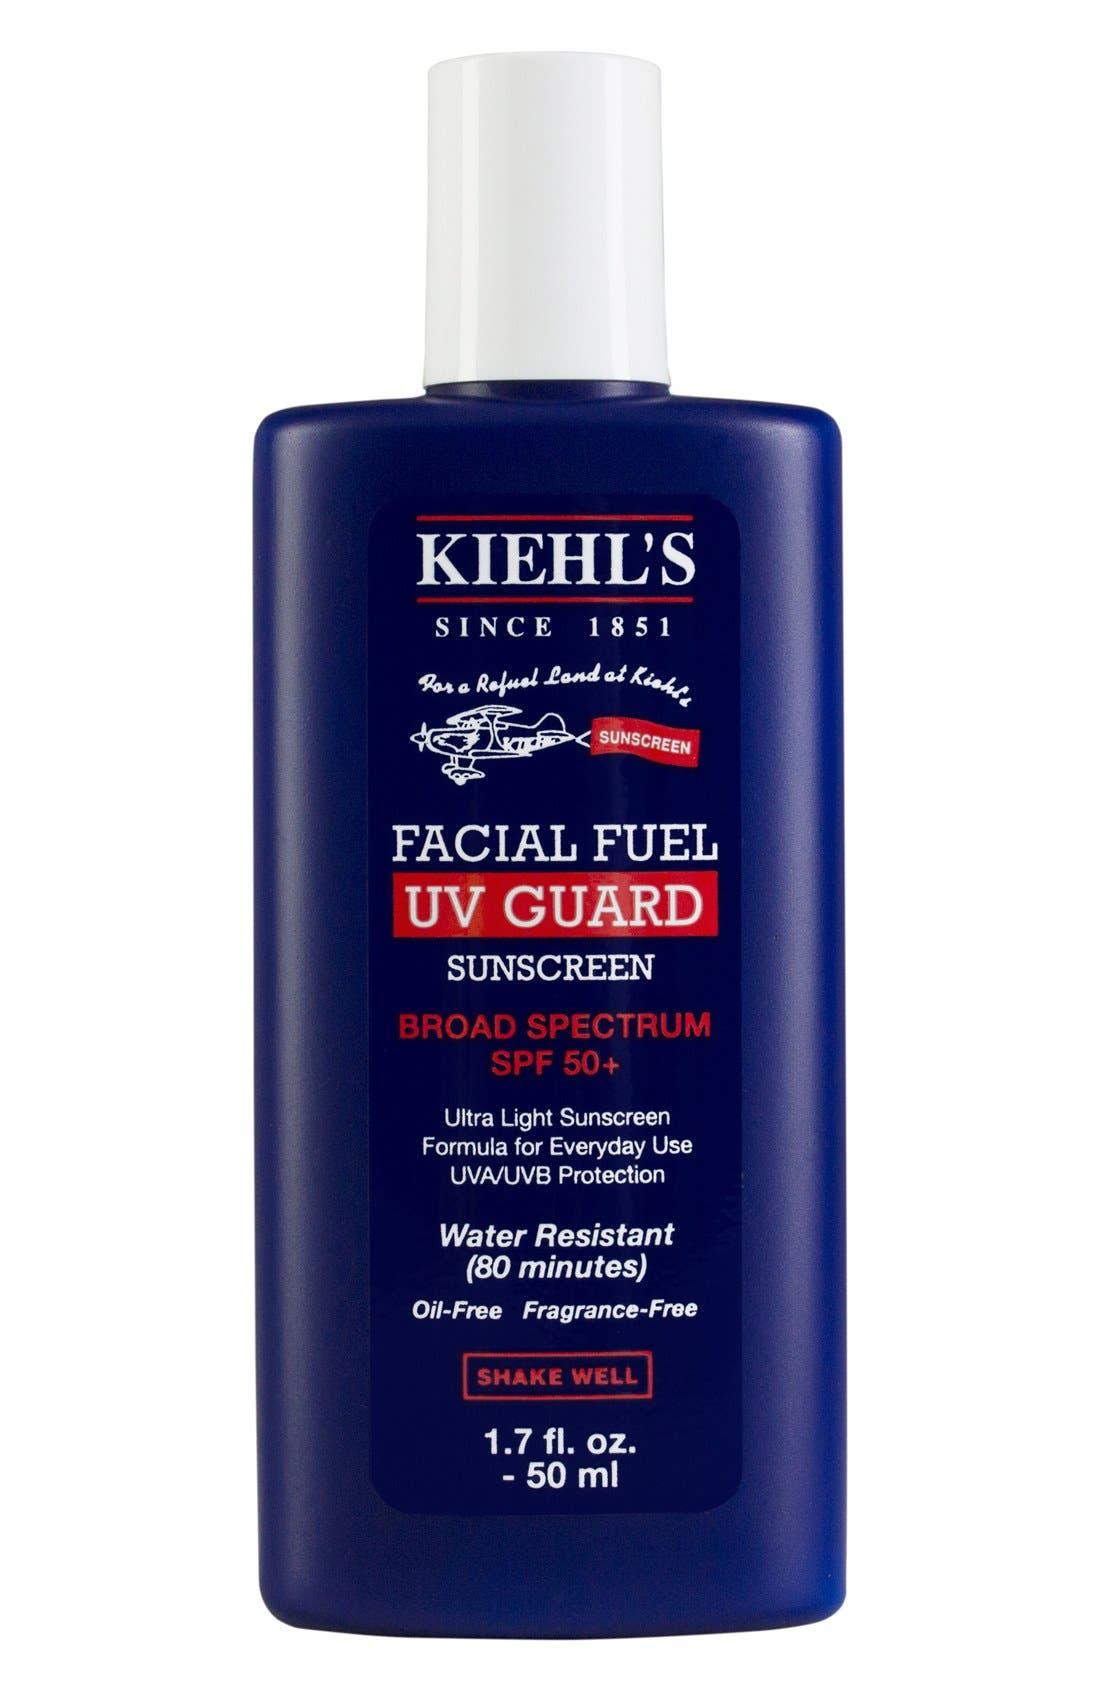 'Facial Fuel - UV Guard' Sunscreen SPF 50,                             Main thumbnail 1, color,                             000